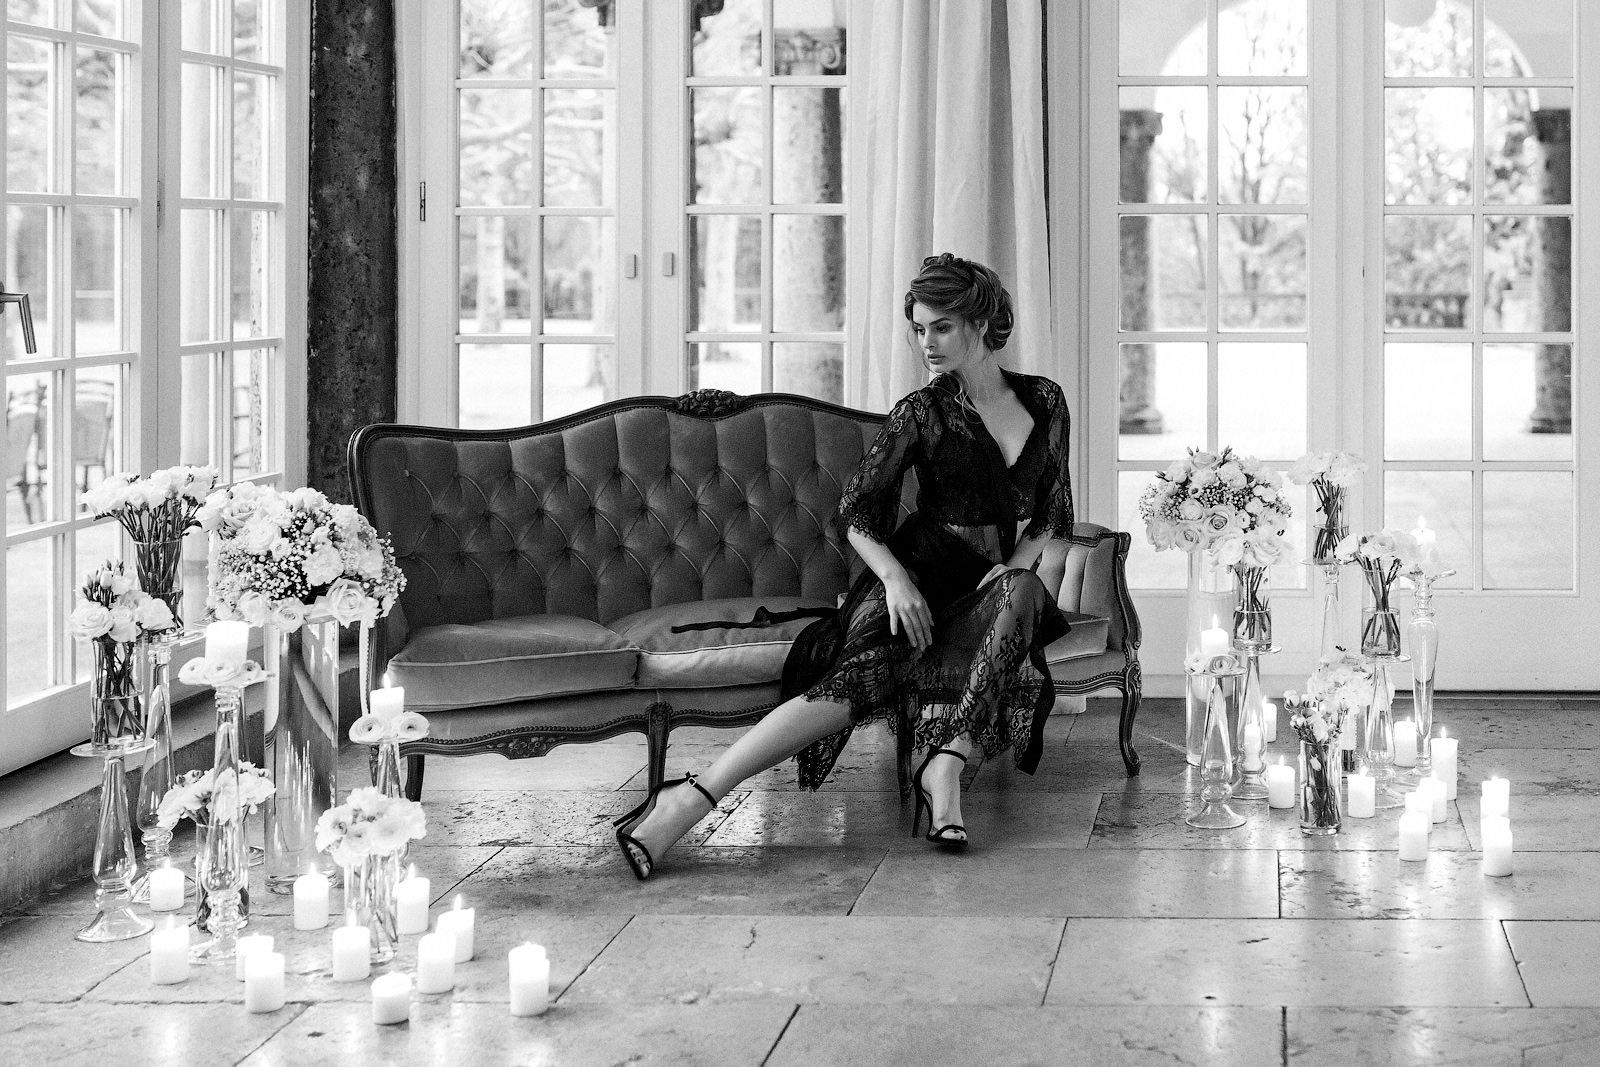 Fotoshooting Boudoir Inspiration im Luxushotel Dolce Bad Nauheim